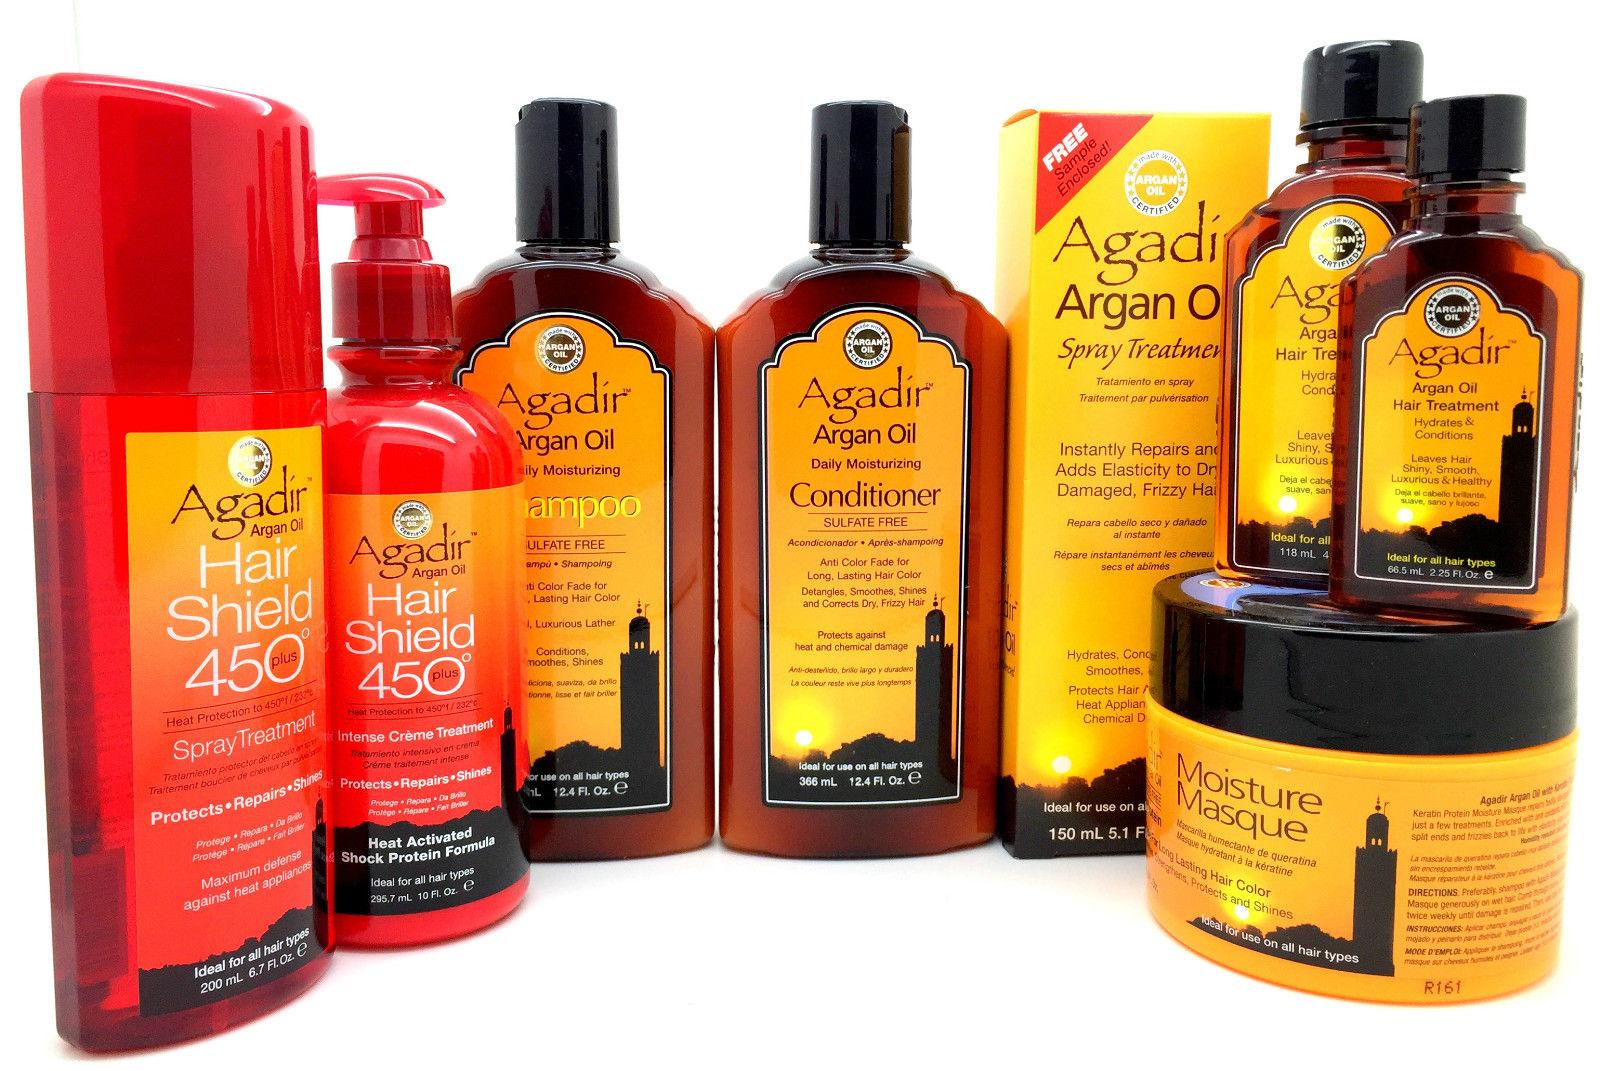 Agadir Argan Oil Sulfate Free Shampoo,Conditioner, Mask